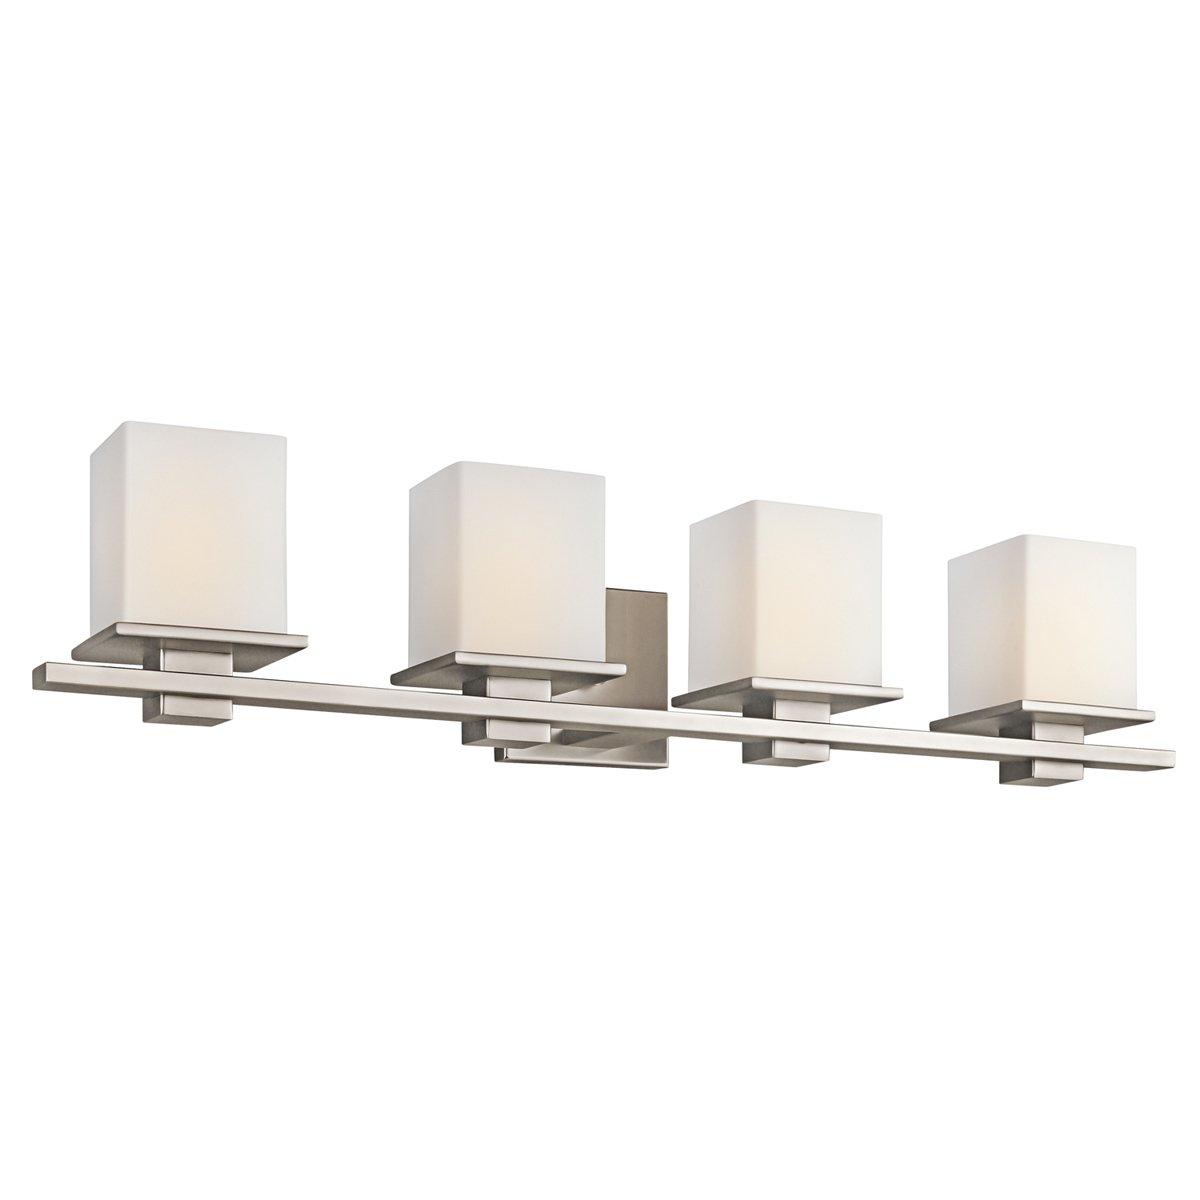 Kichler 45152ap four light bath vanity lighting fixtures amazon arubaitofo Image collections